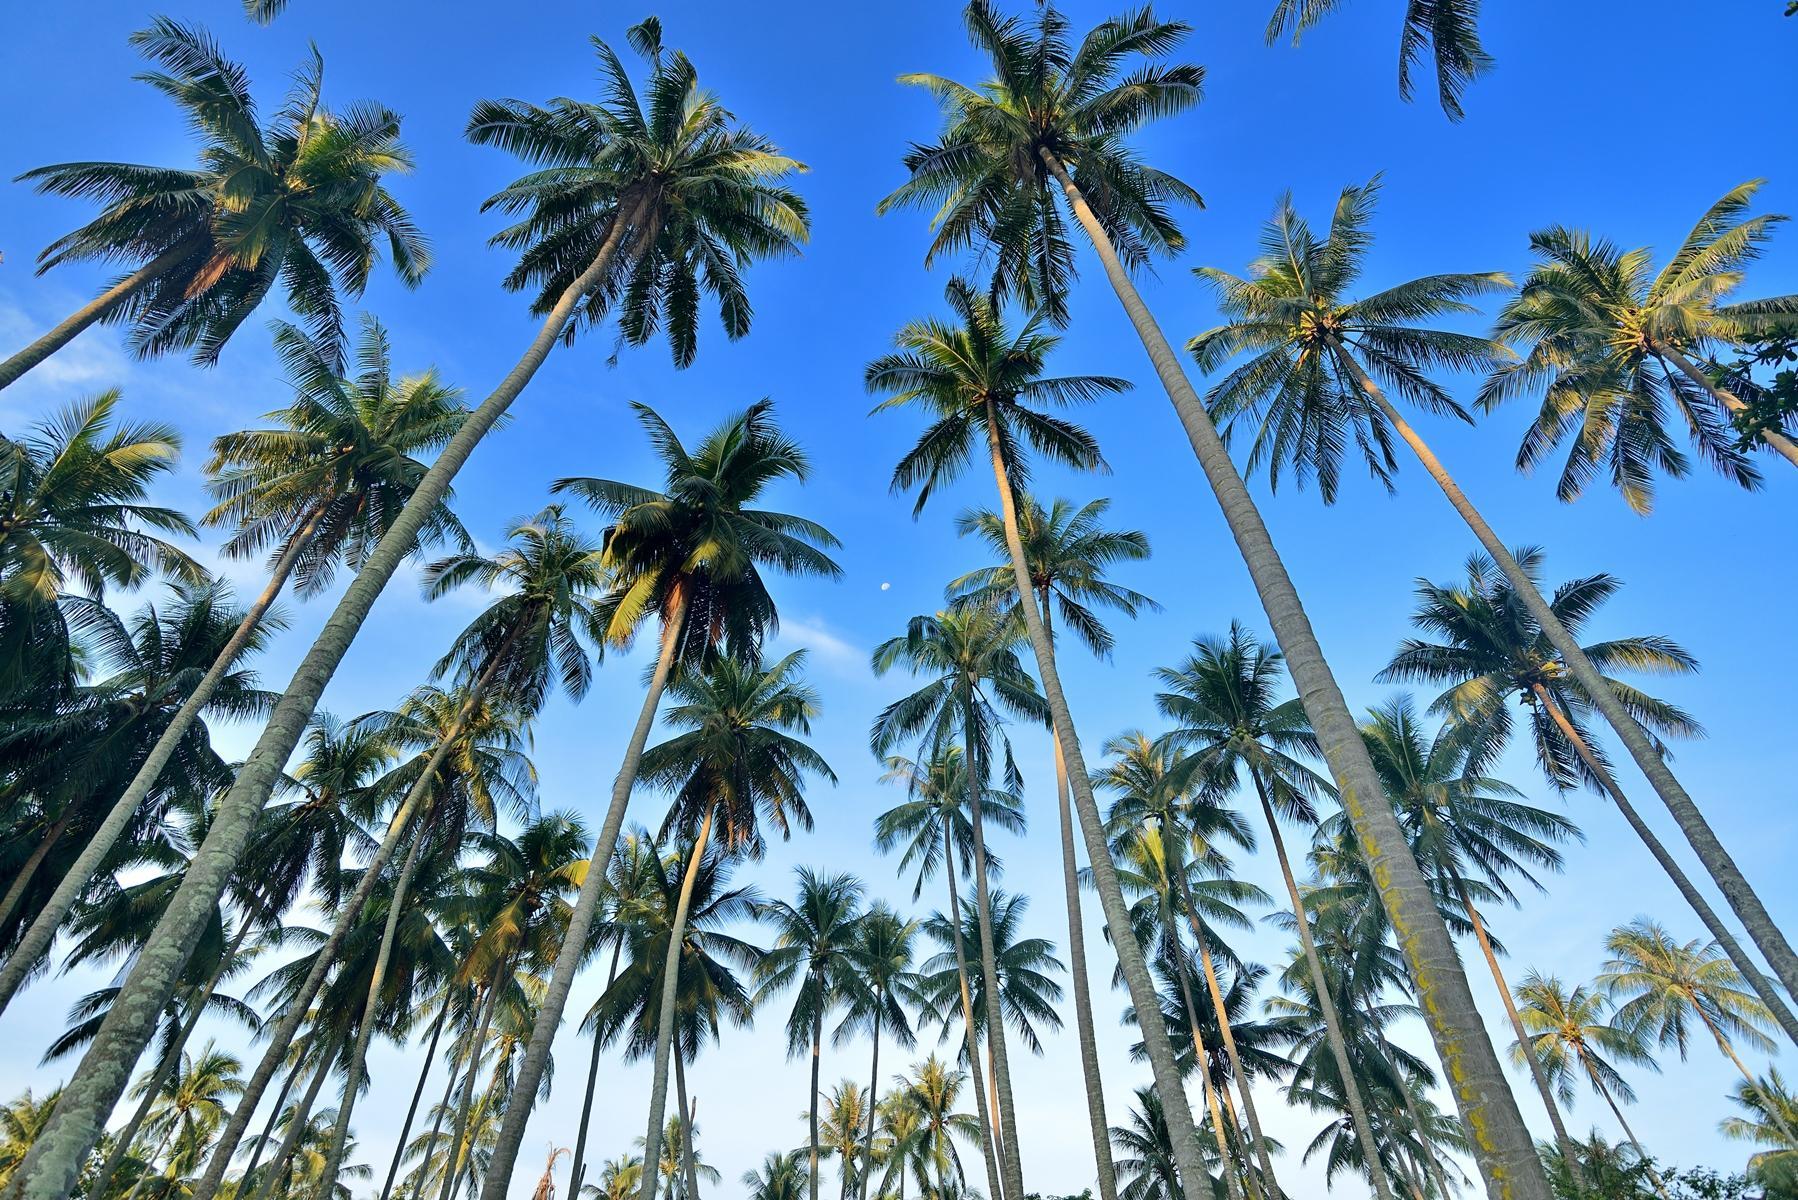 Coconut Palm - KHAO SOK National Park, Thailand